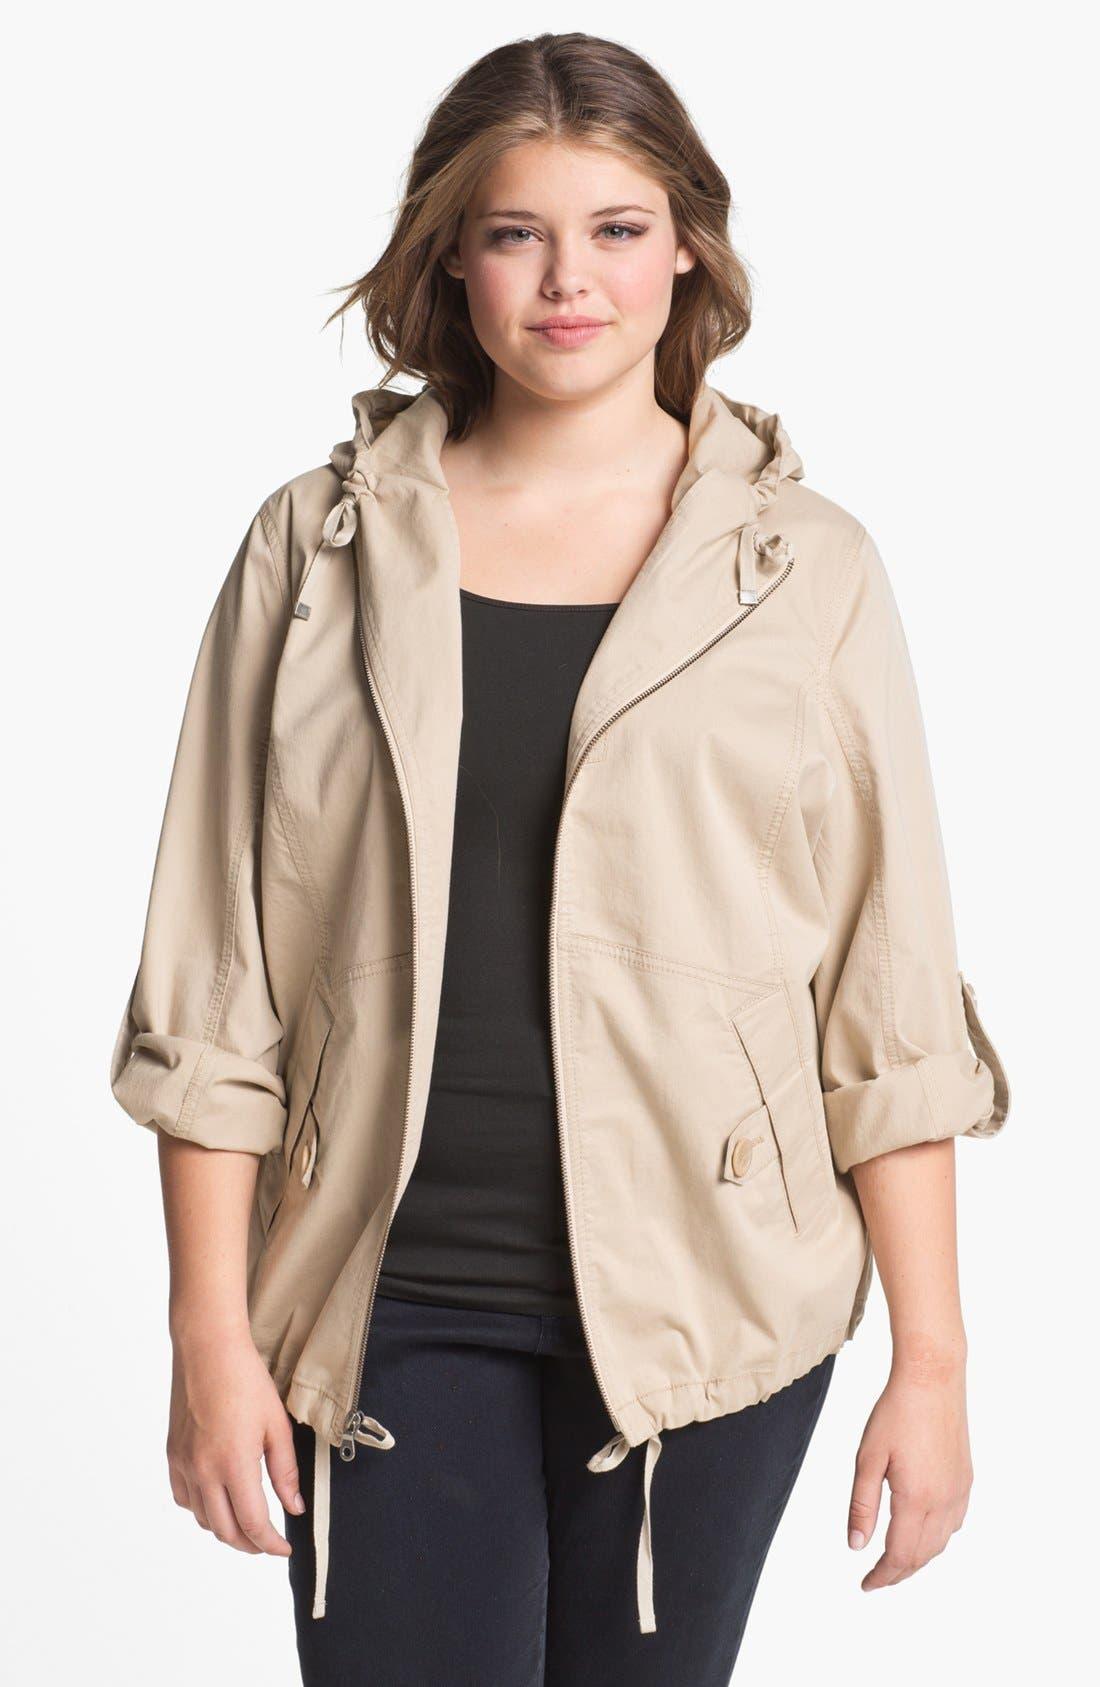 Alternate Image 1 Selected - Sejour 'Megan' Front Zip Hooded Jacket (Plus Size)